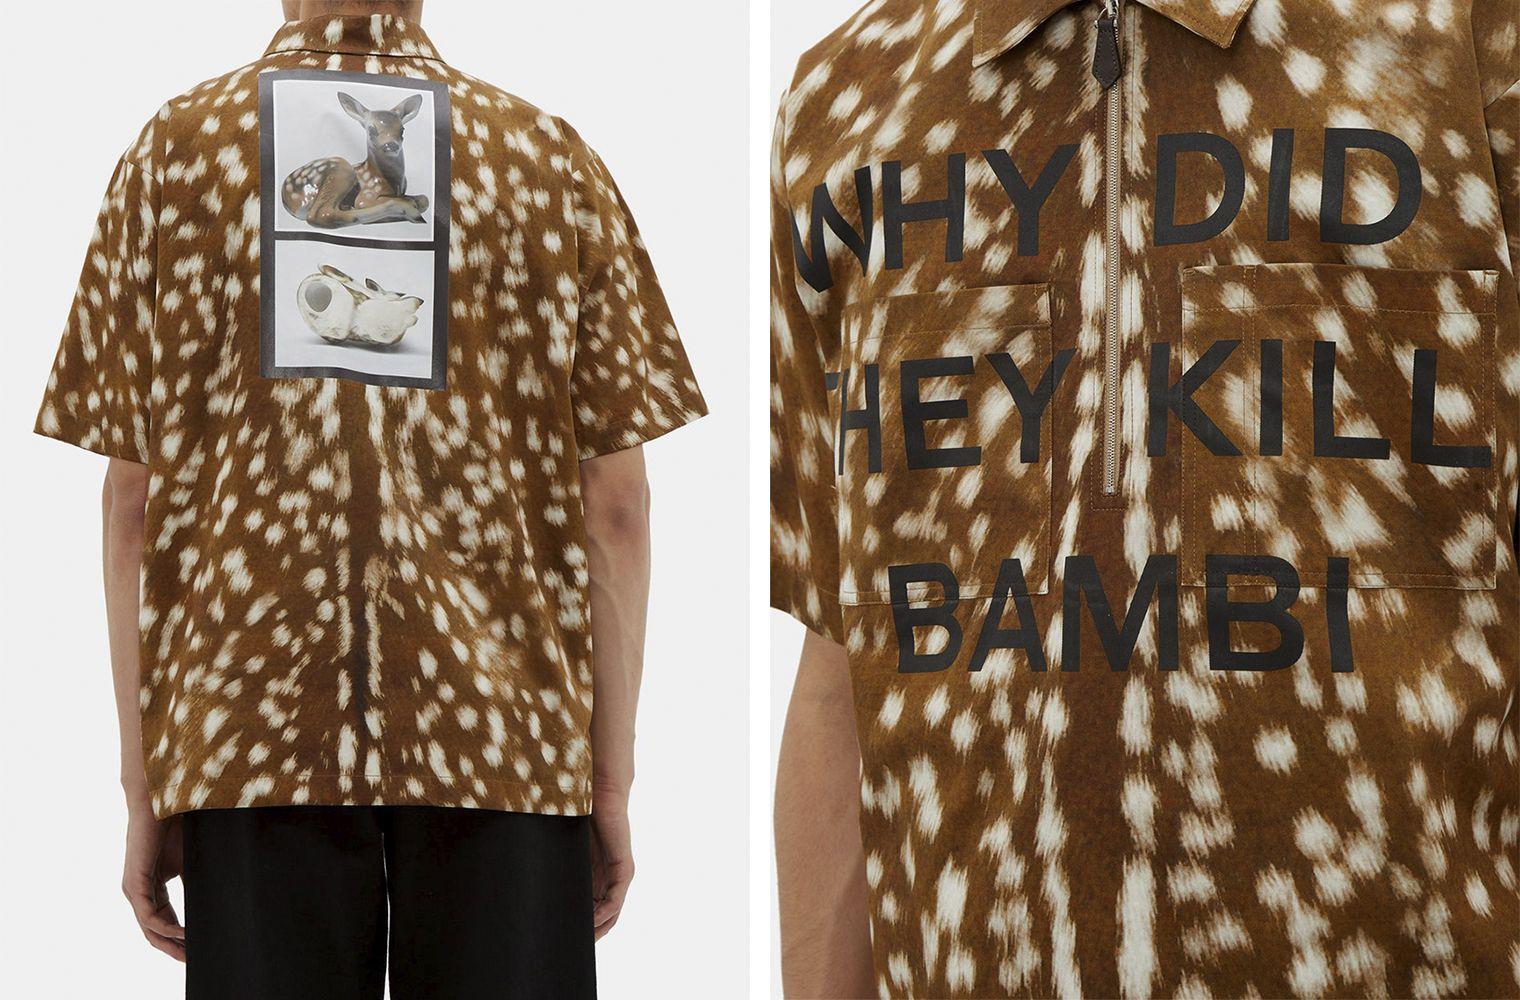 Рубашка с Бэмби из коллекции Burberry Spring/Summer 2019 Ready-to-Wear